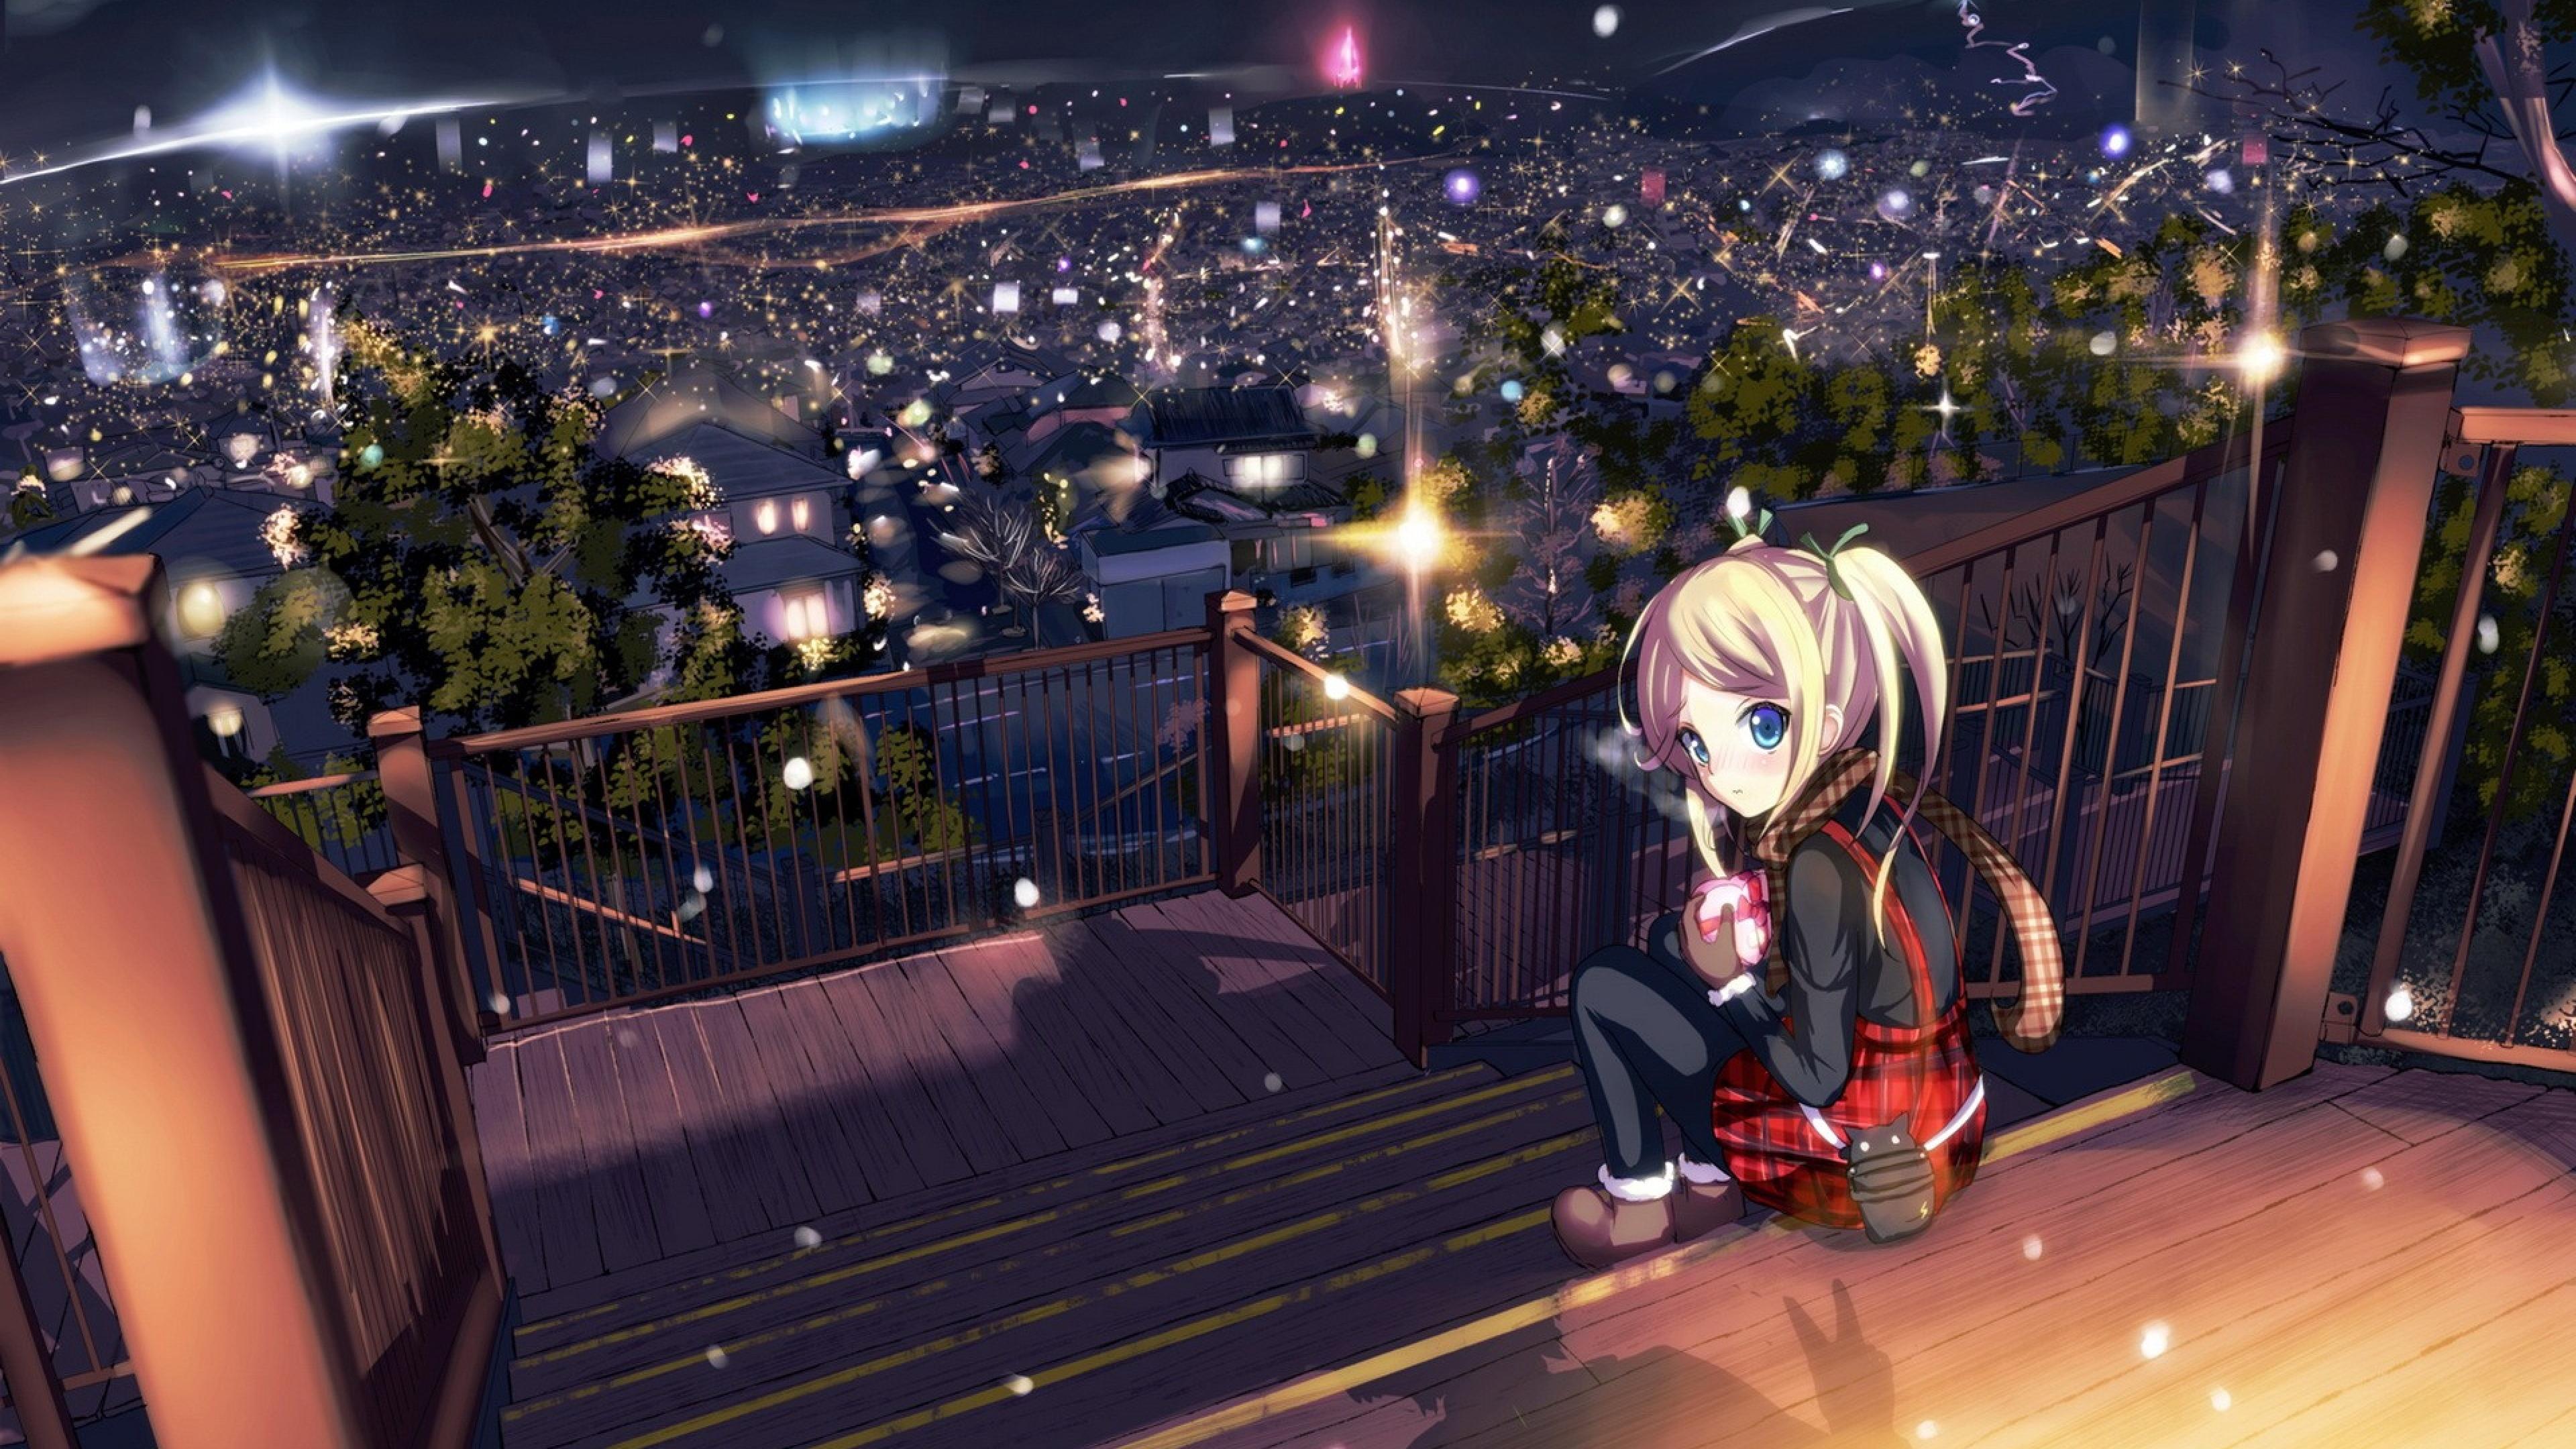 3840x2160 Wallpaper landscape blue anime 3840x2160